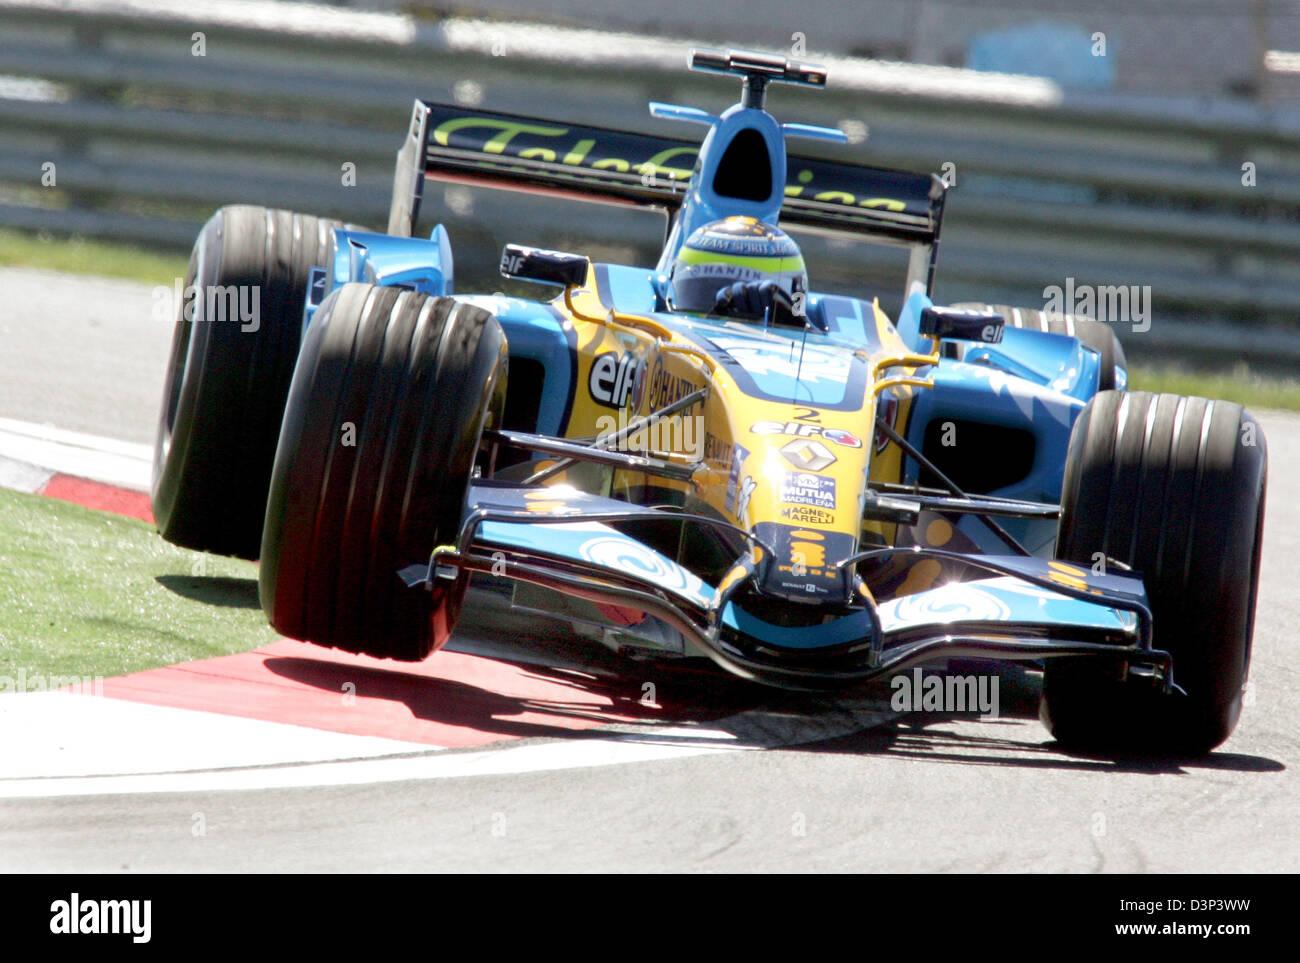 Italian Formula One Driver Giancarlo Fisichella Of Renault